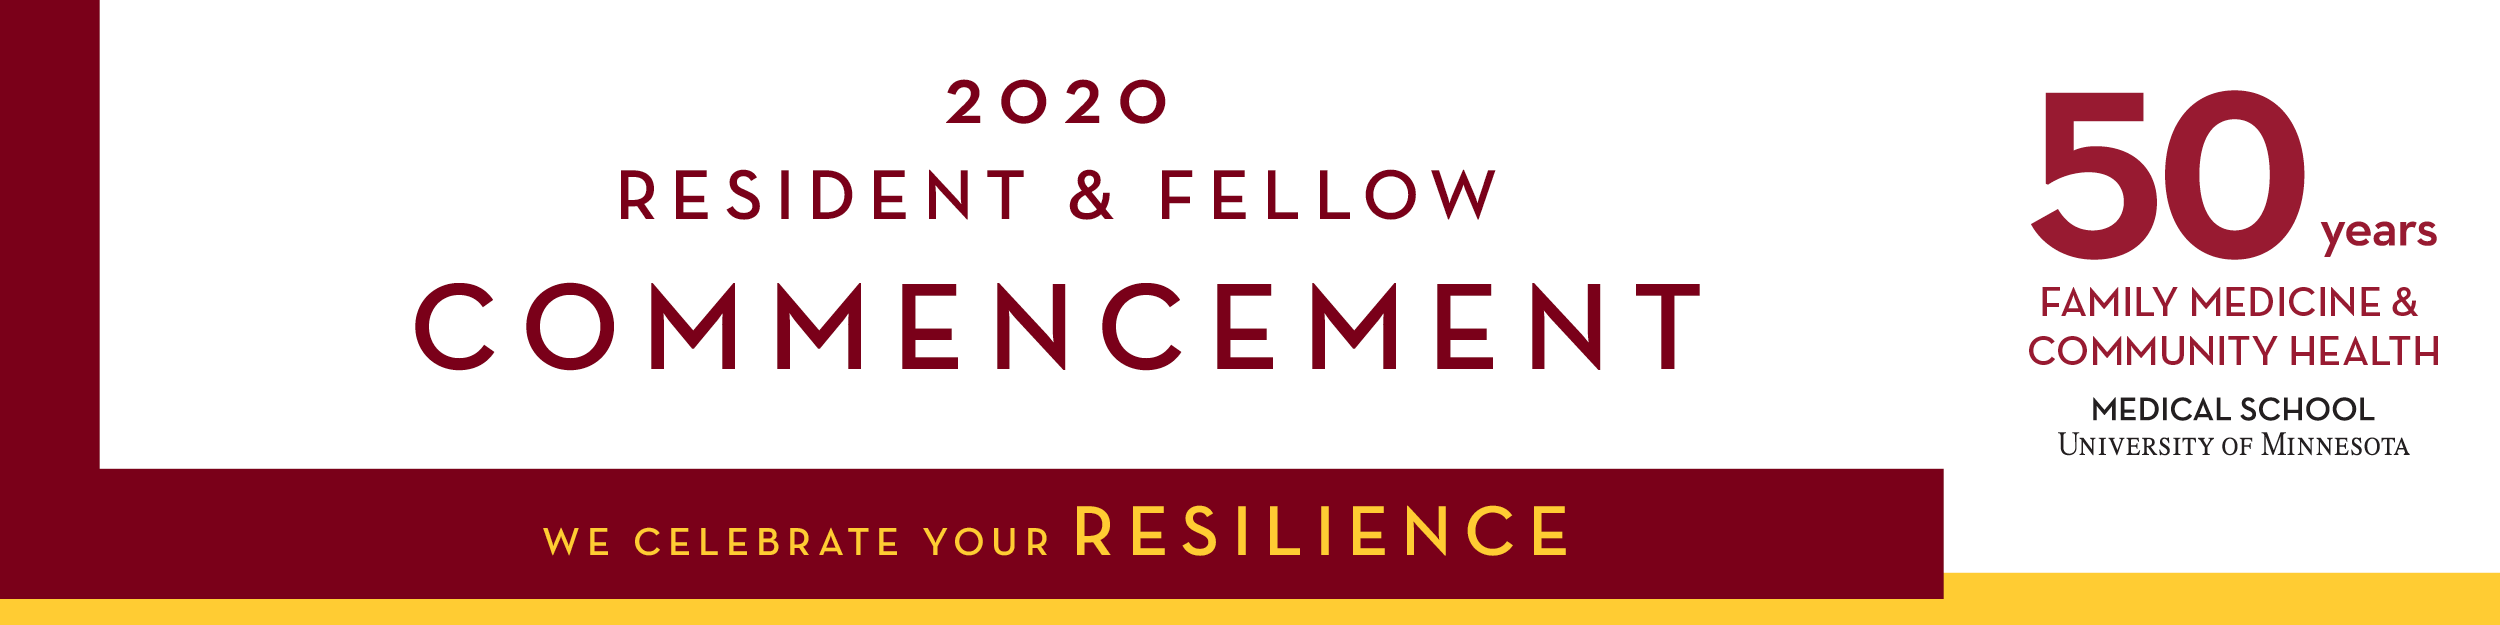 University Of Minnesota2020 2021 Academic Calendar Pertaining To University Of Phoenix 2021 Calendar